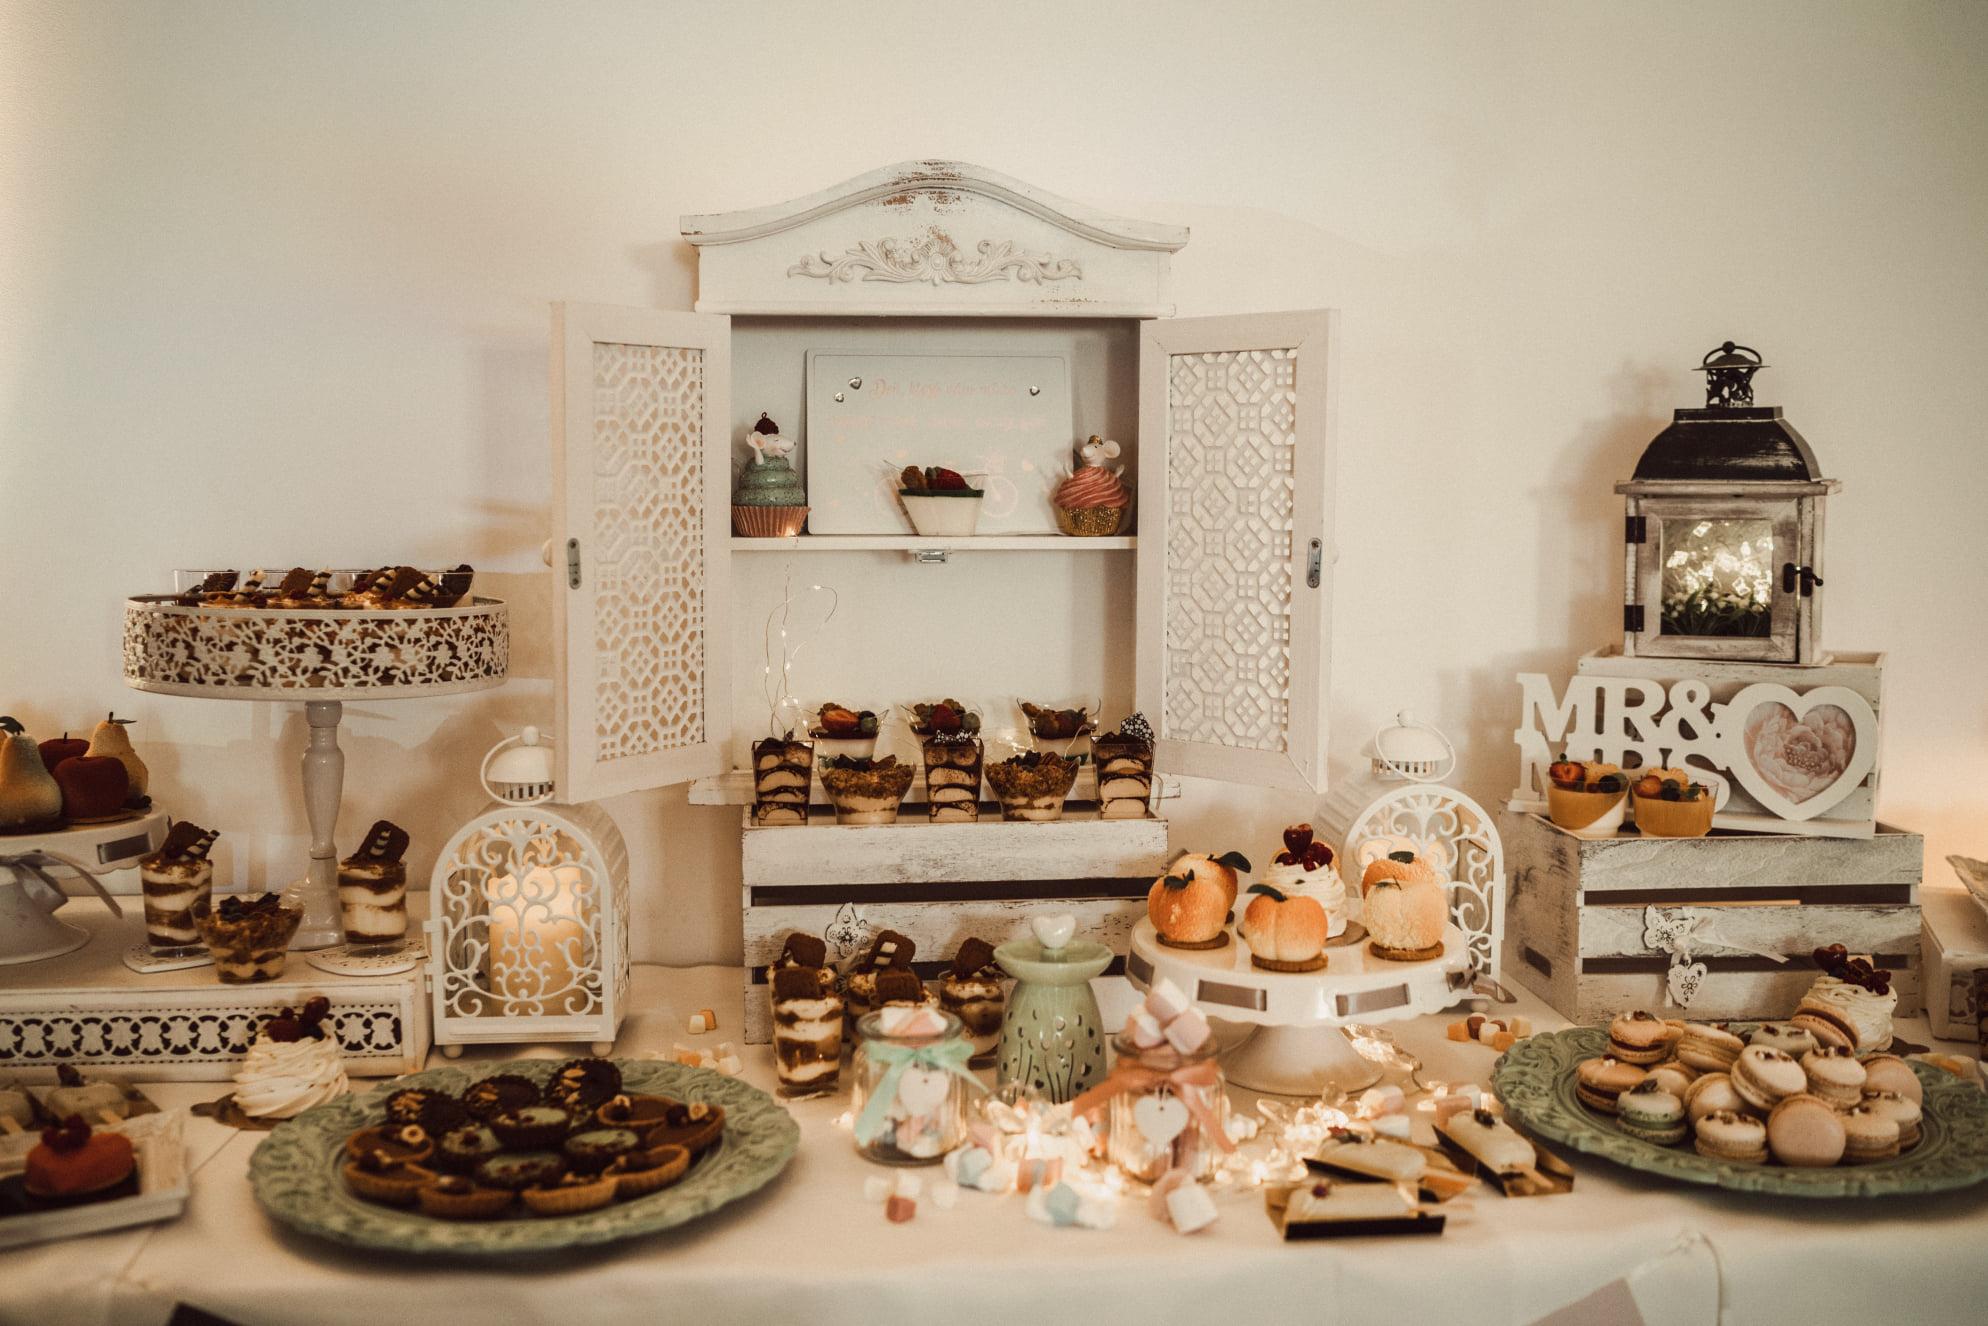 catering-kolace-svadbajpg